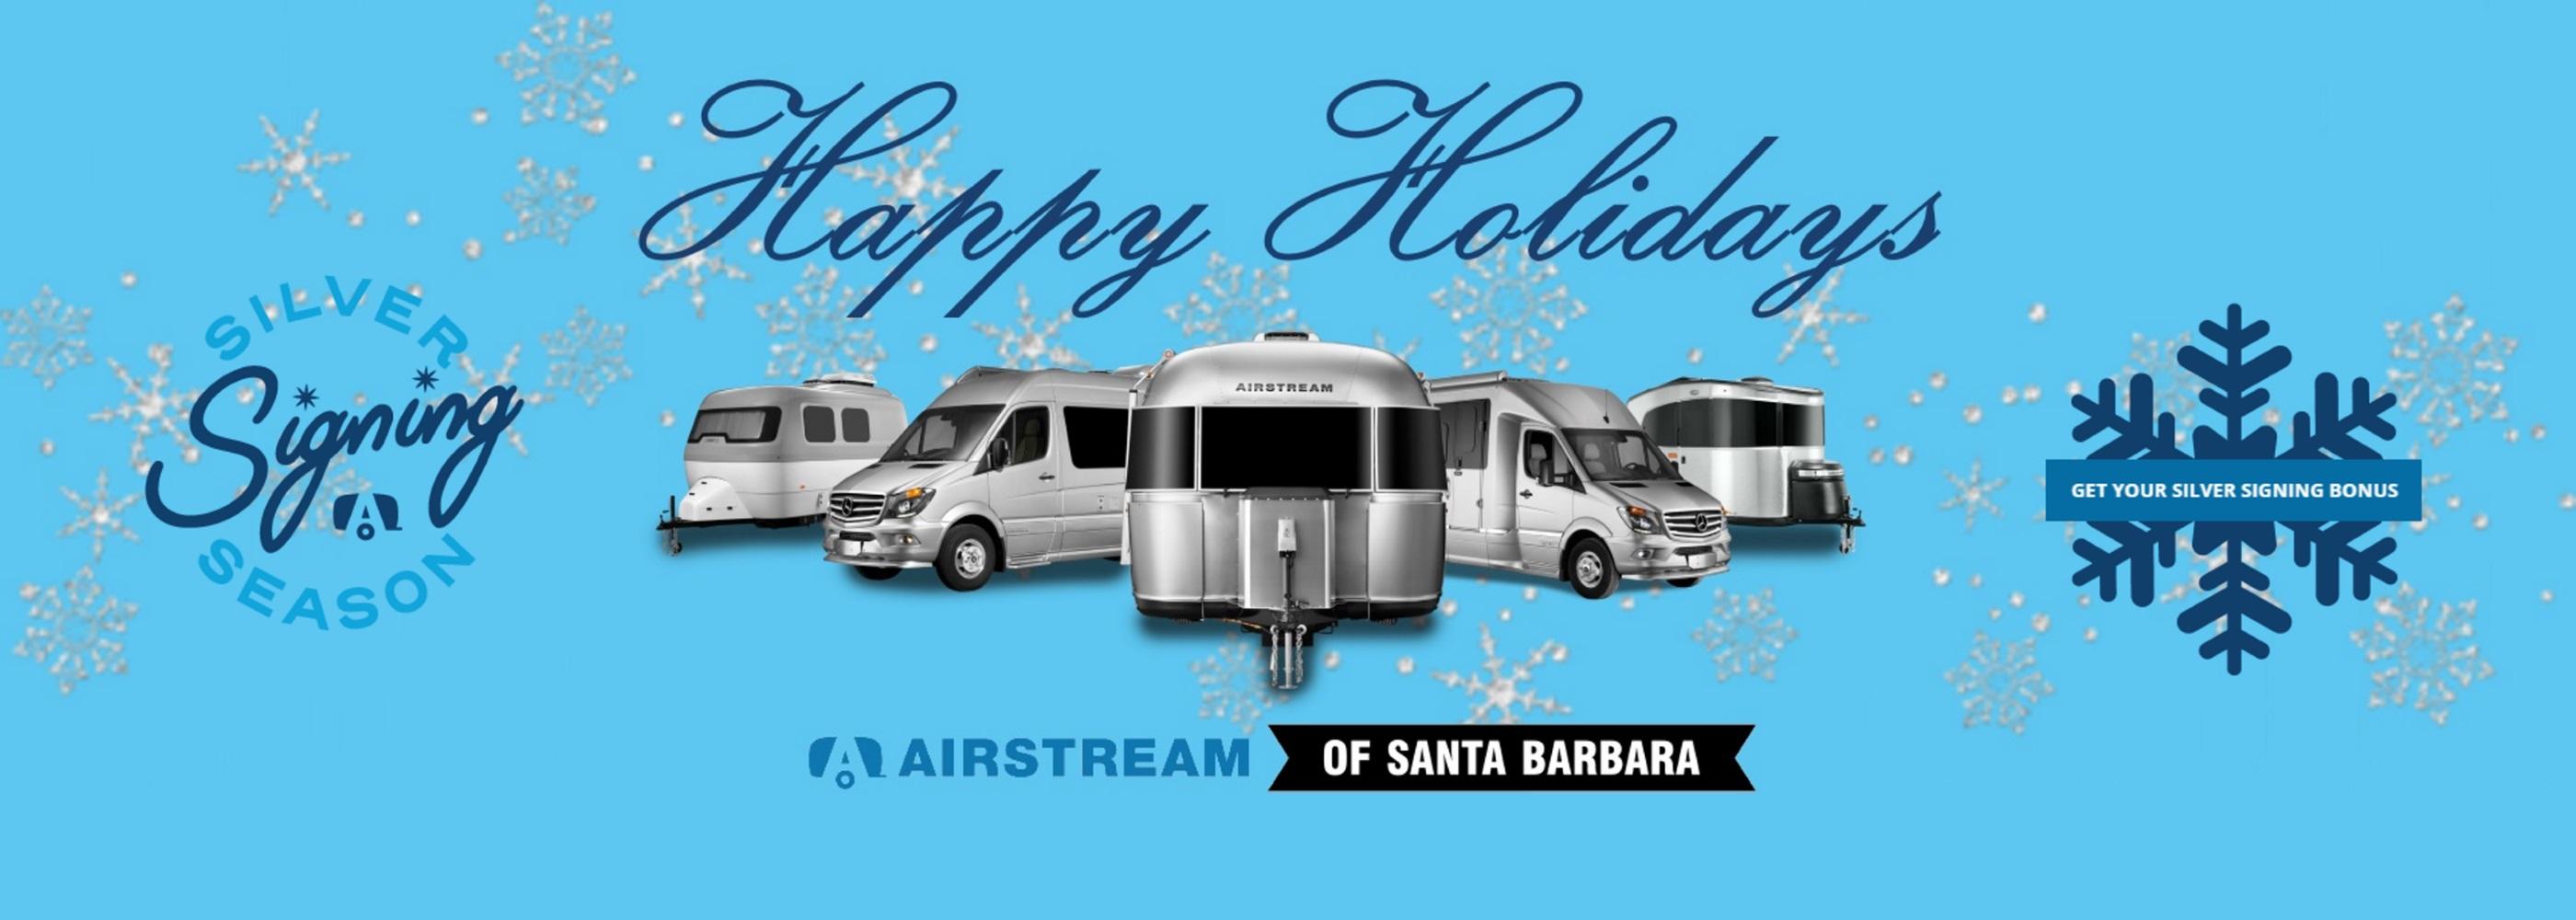 Happy Holidays Asb 2019 Website Slider